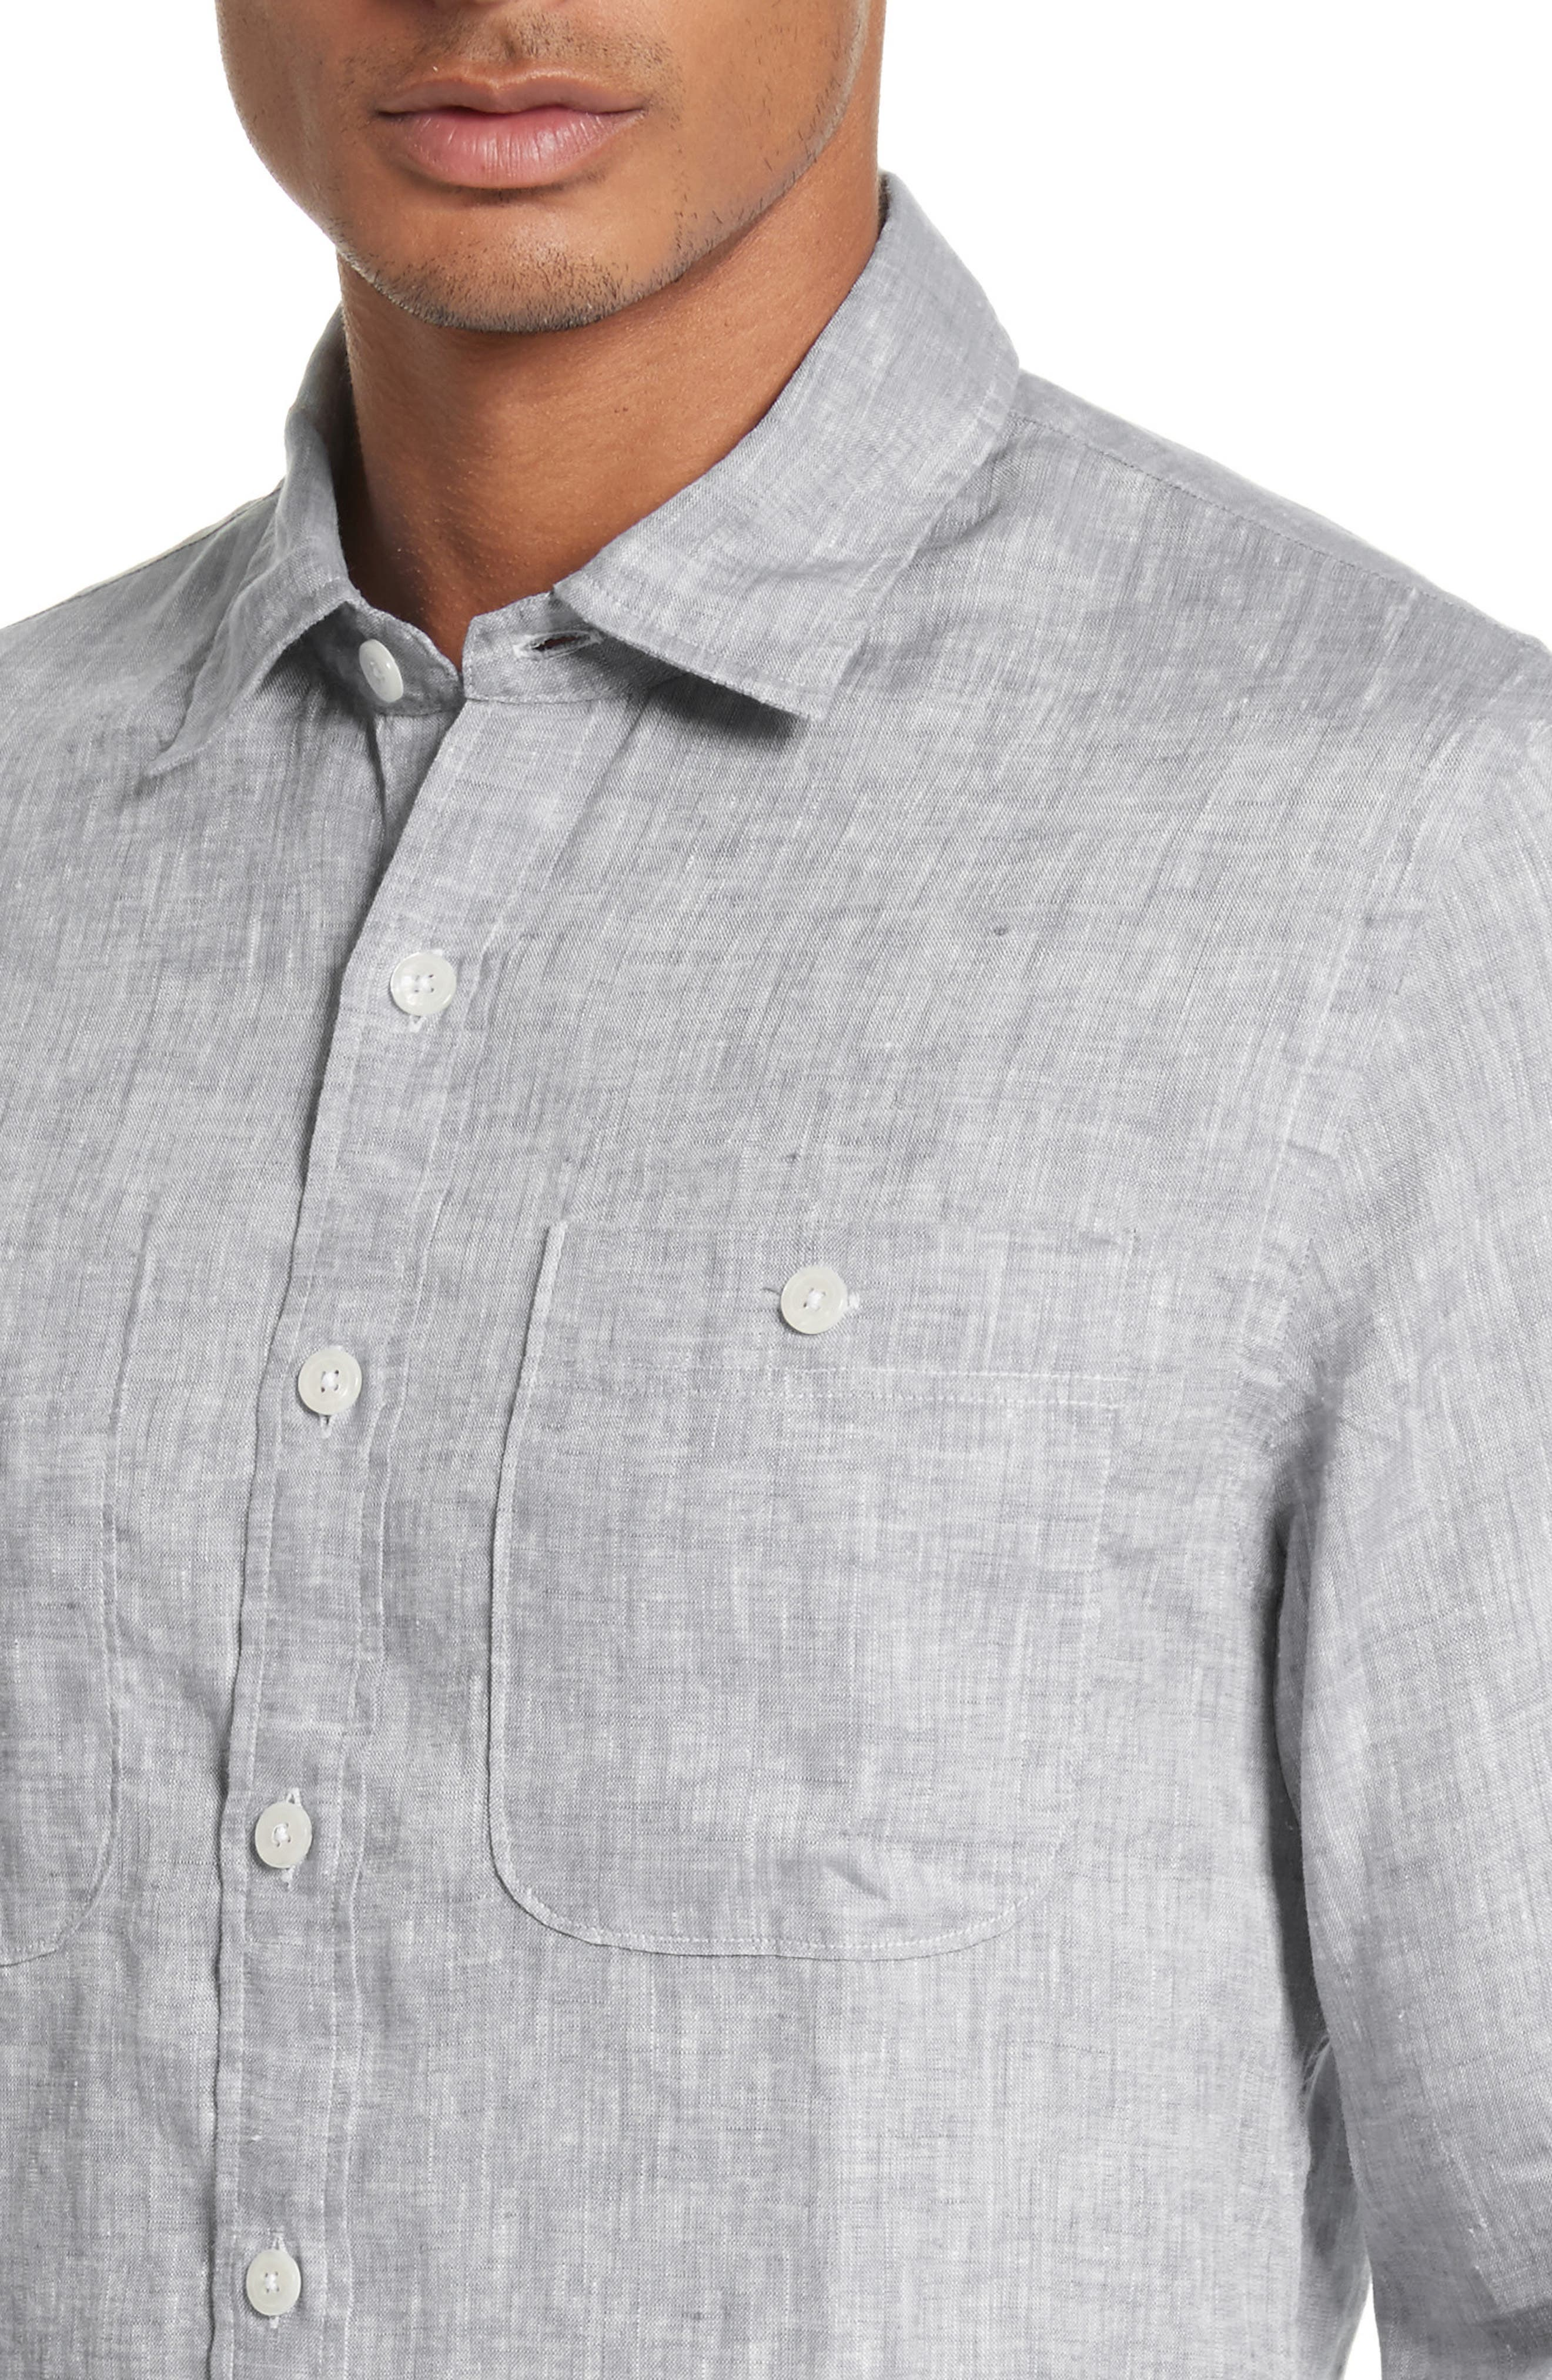 Linen Shirt,                             Alternate thumbnail 4, color,                             Light Grey